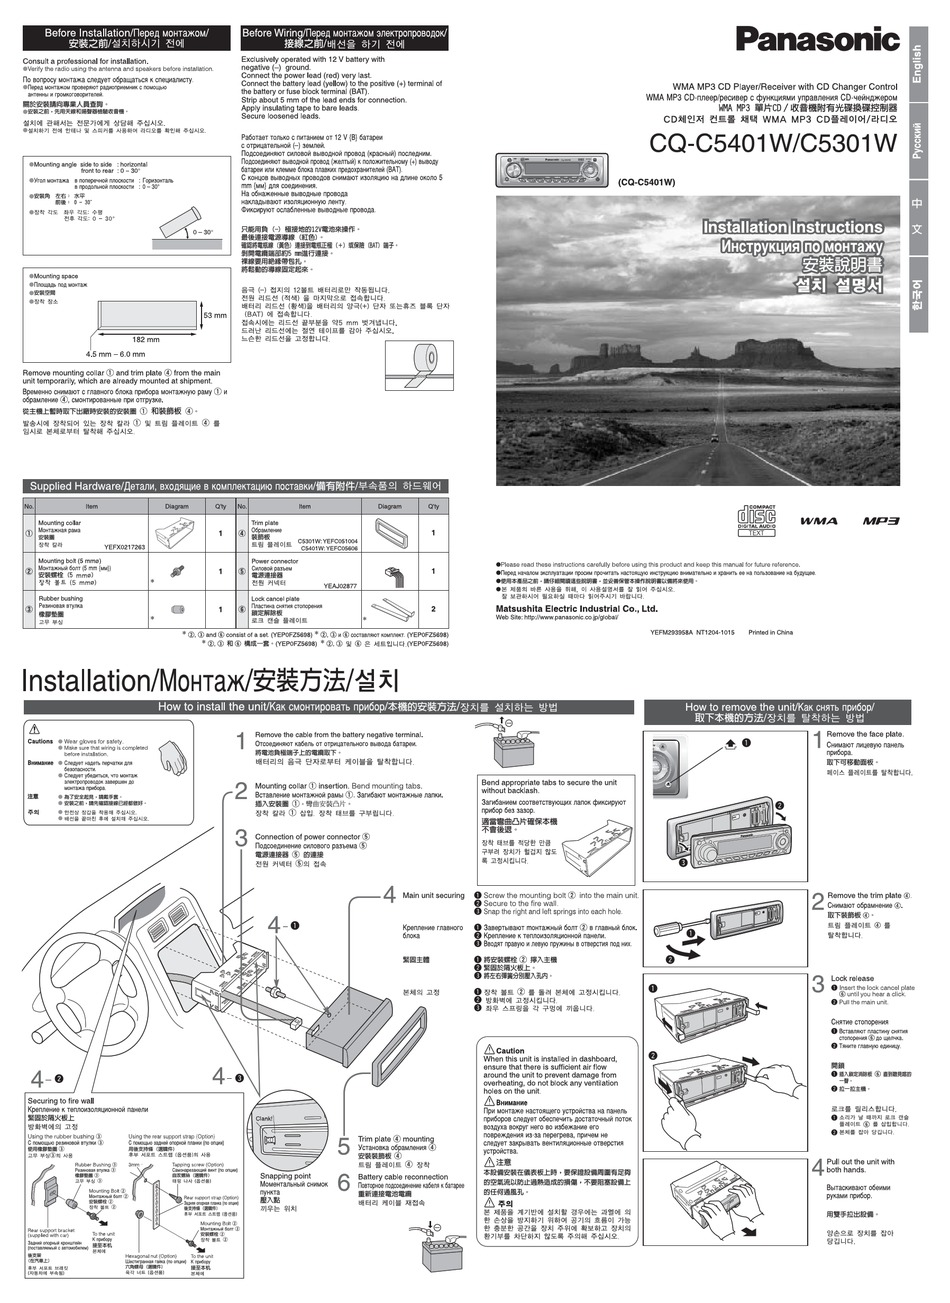 PANASONIC CQ-C5401W INSTALLATION INSTRUCTIONS Pdf Download